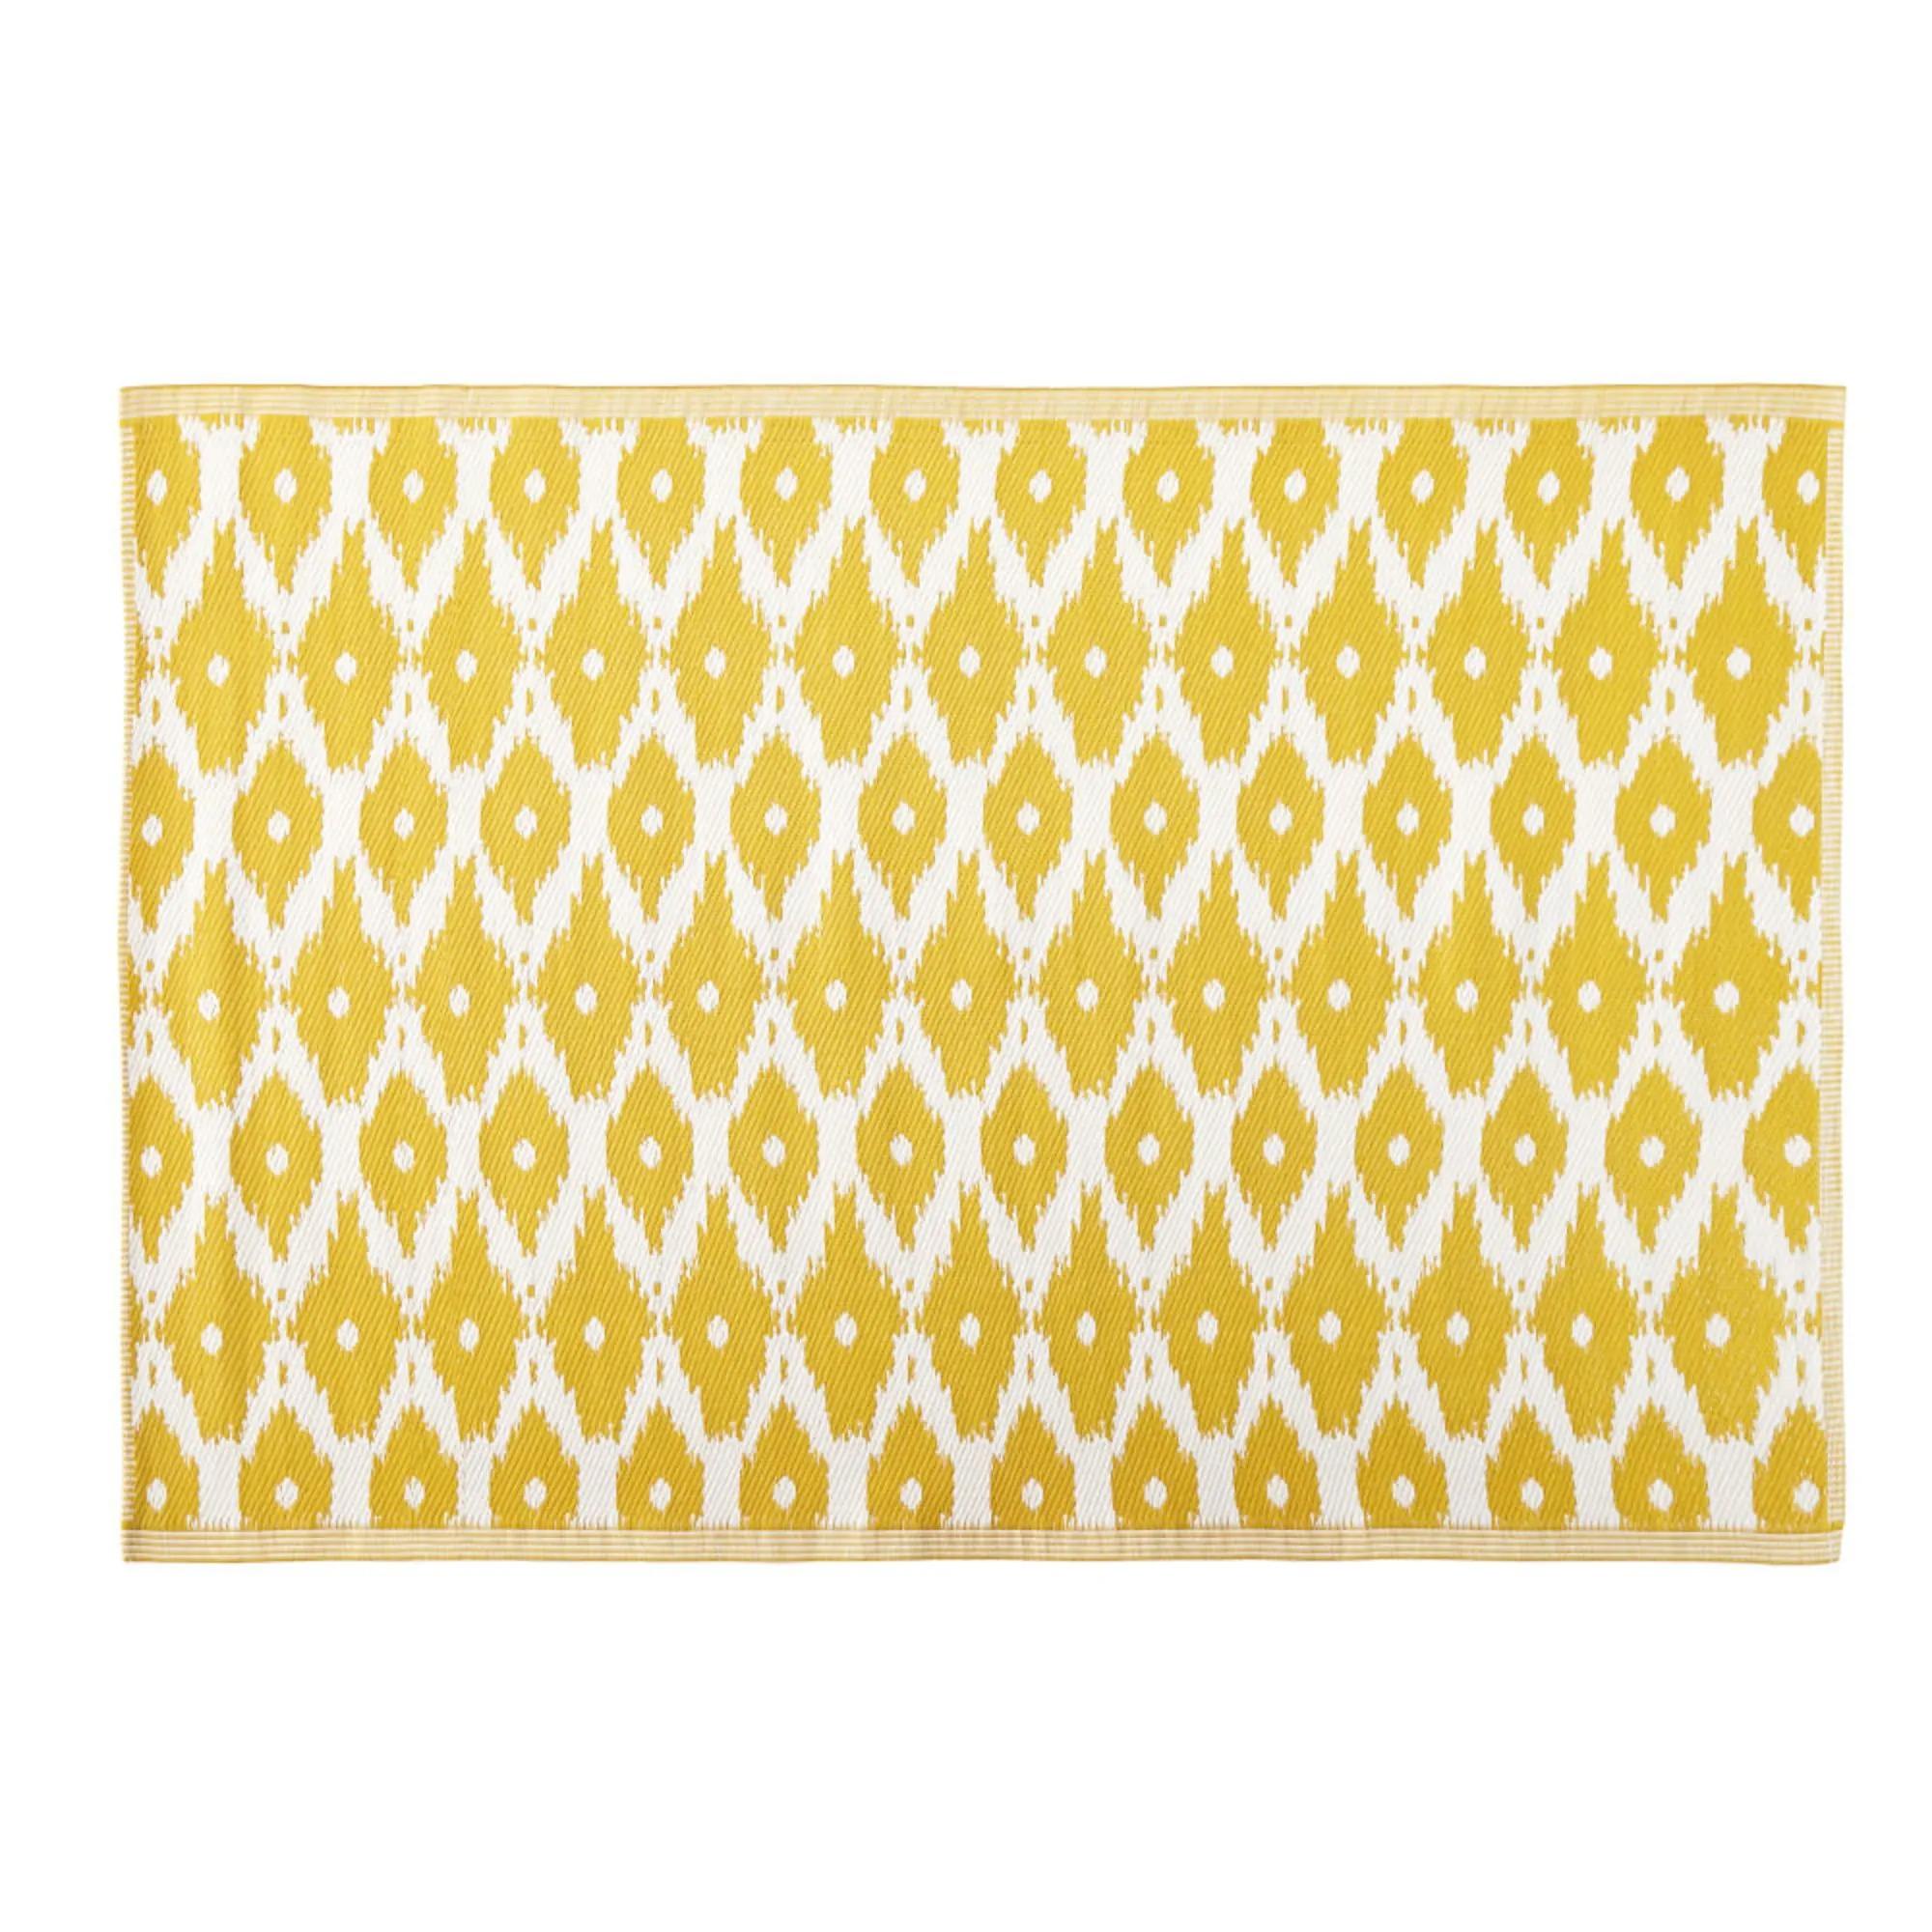 DATHU.- Alfombra de exterior amarilla con motivos decorativos blancos 140x200 cms